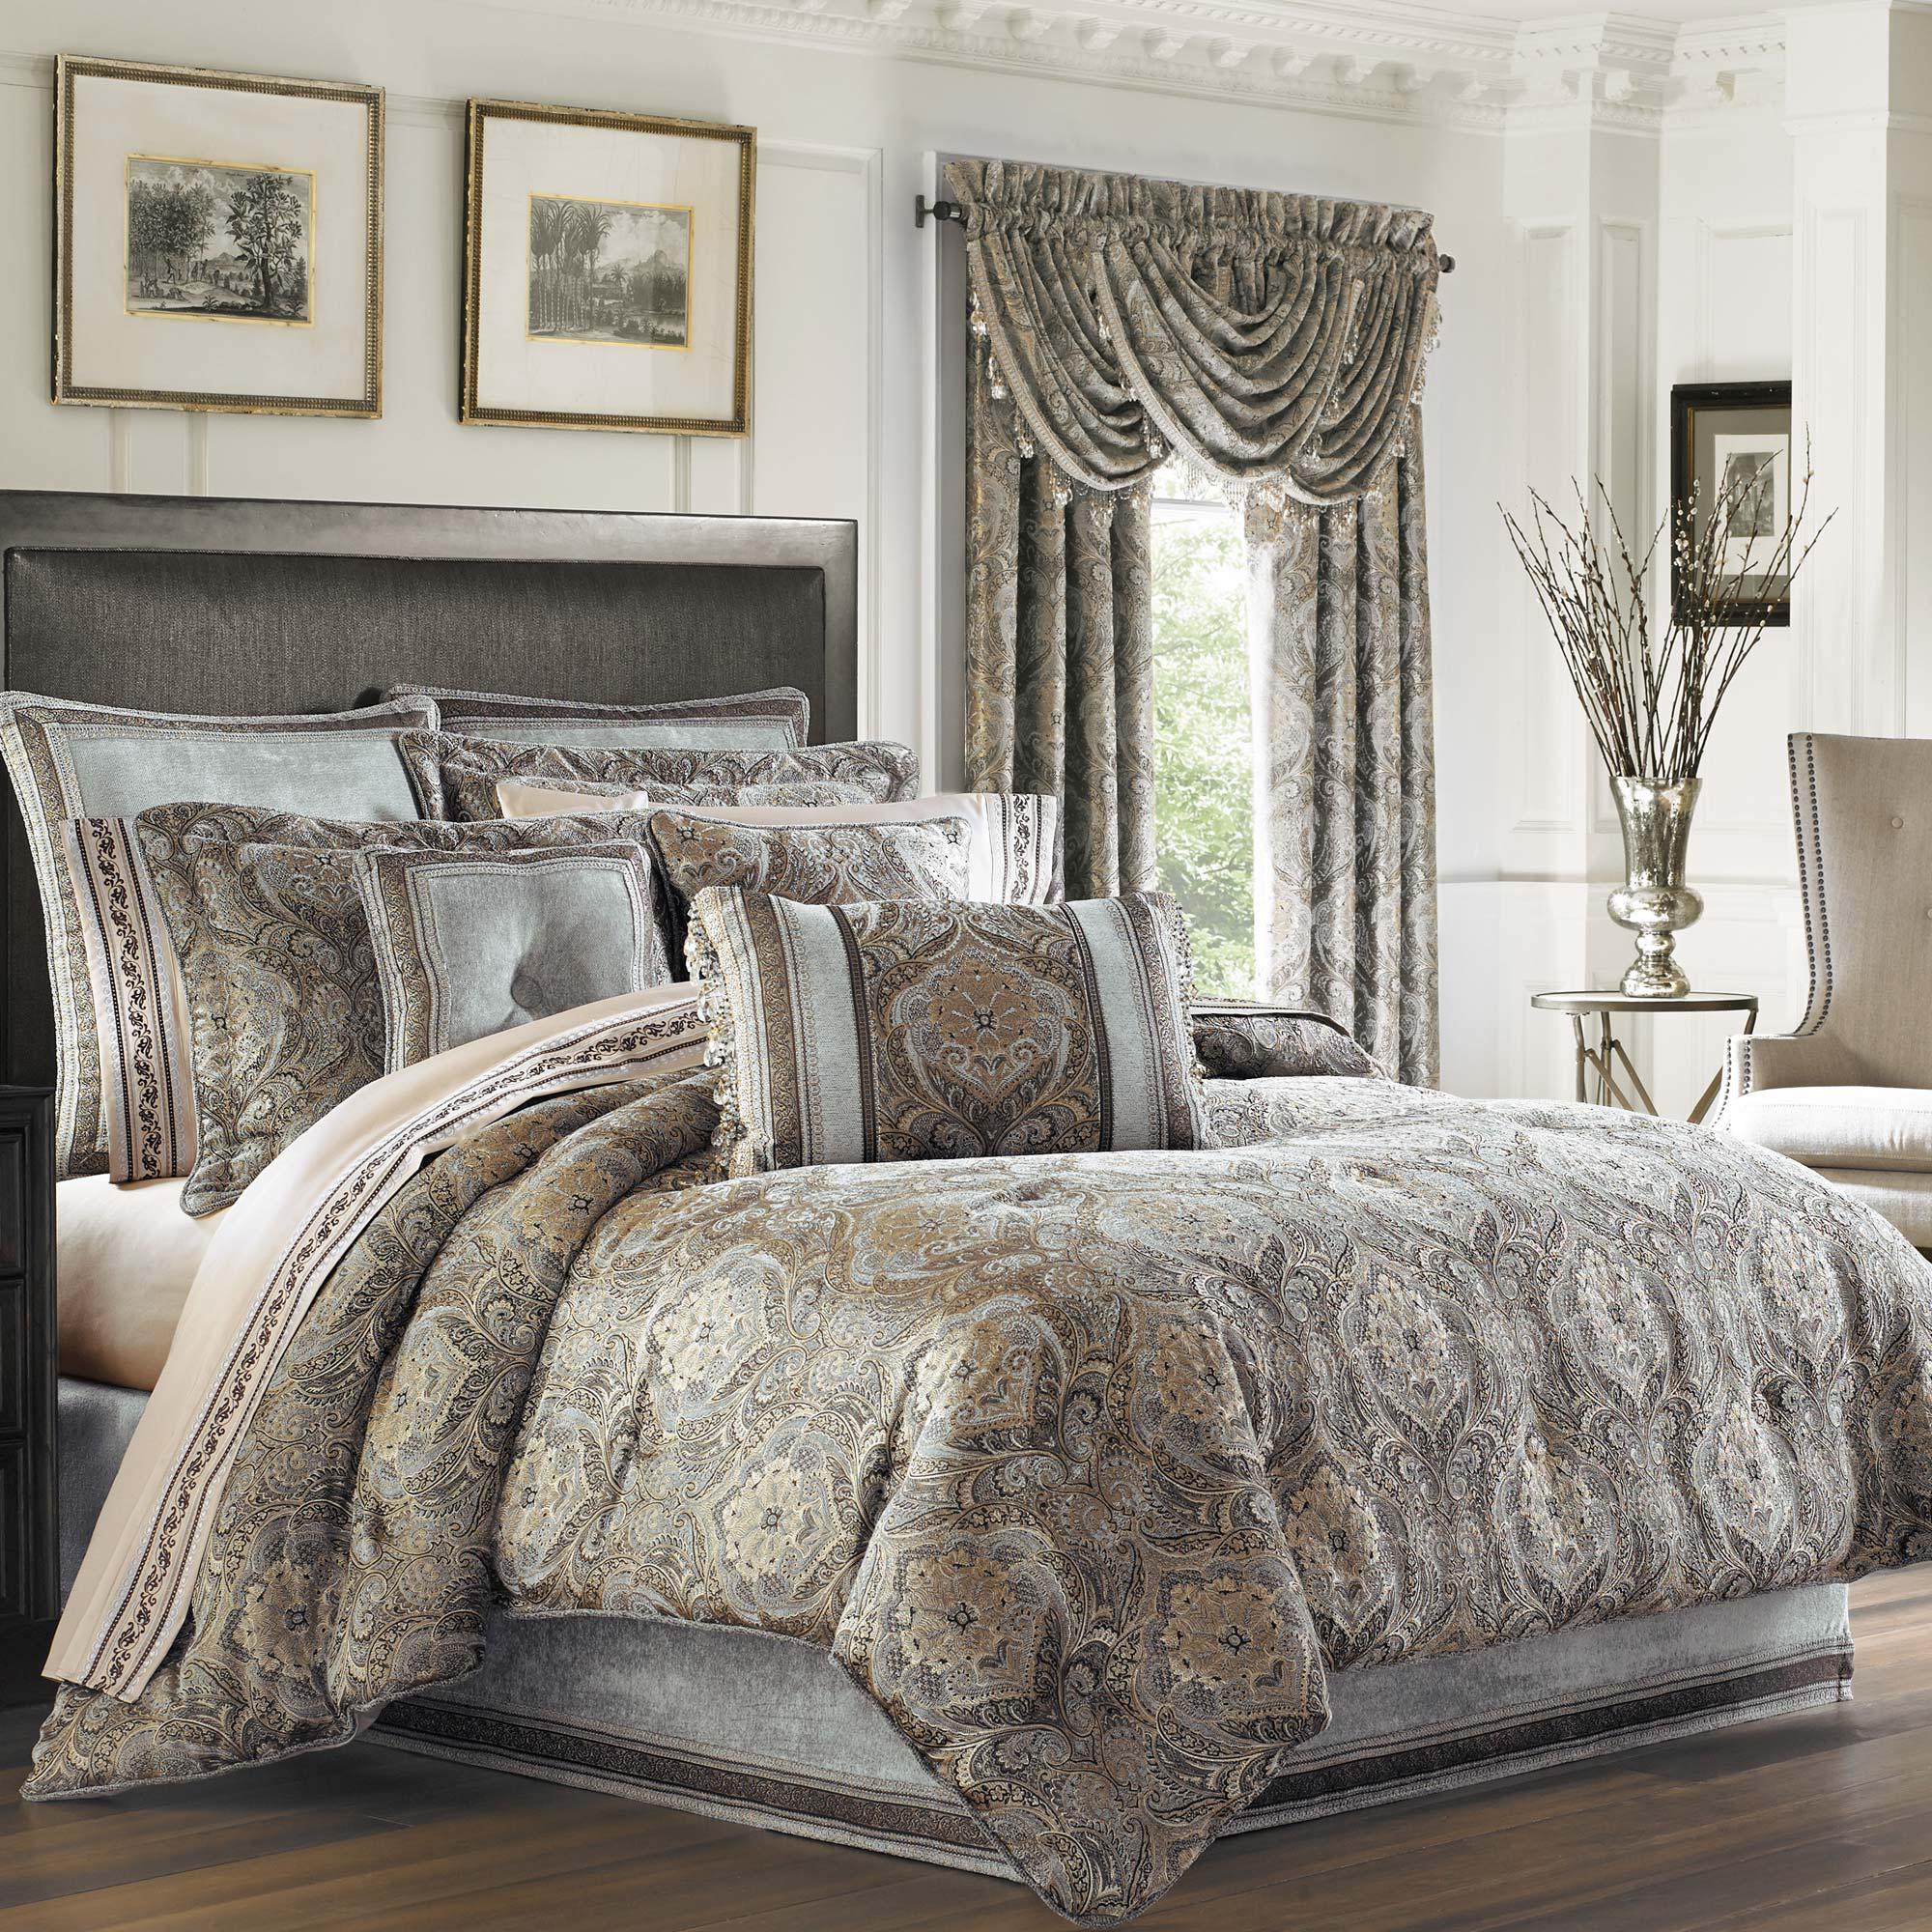 provence stone queen 4 piece comforter set